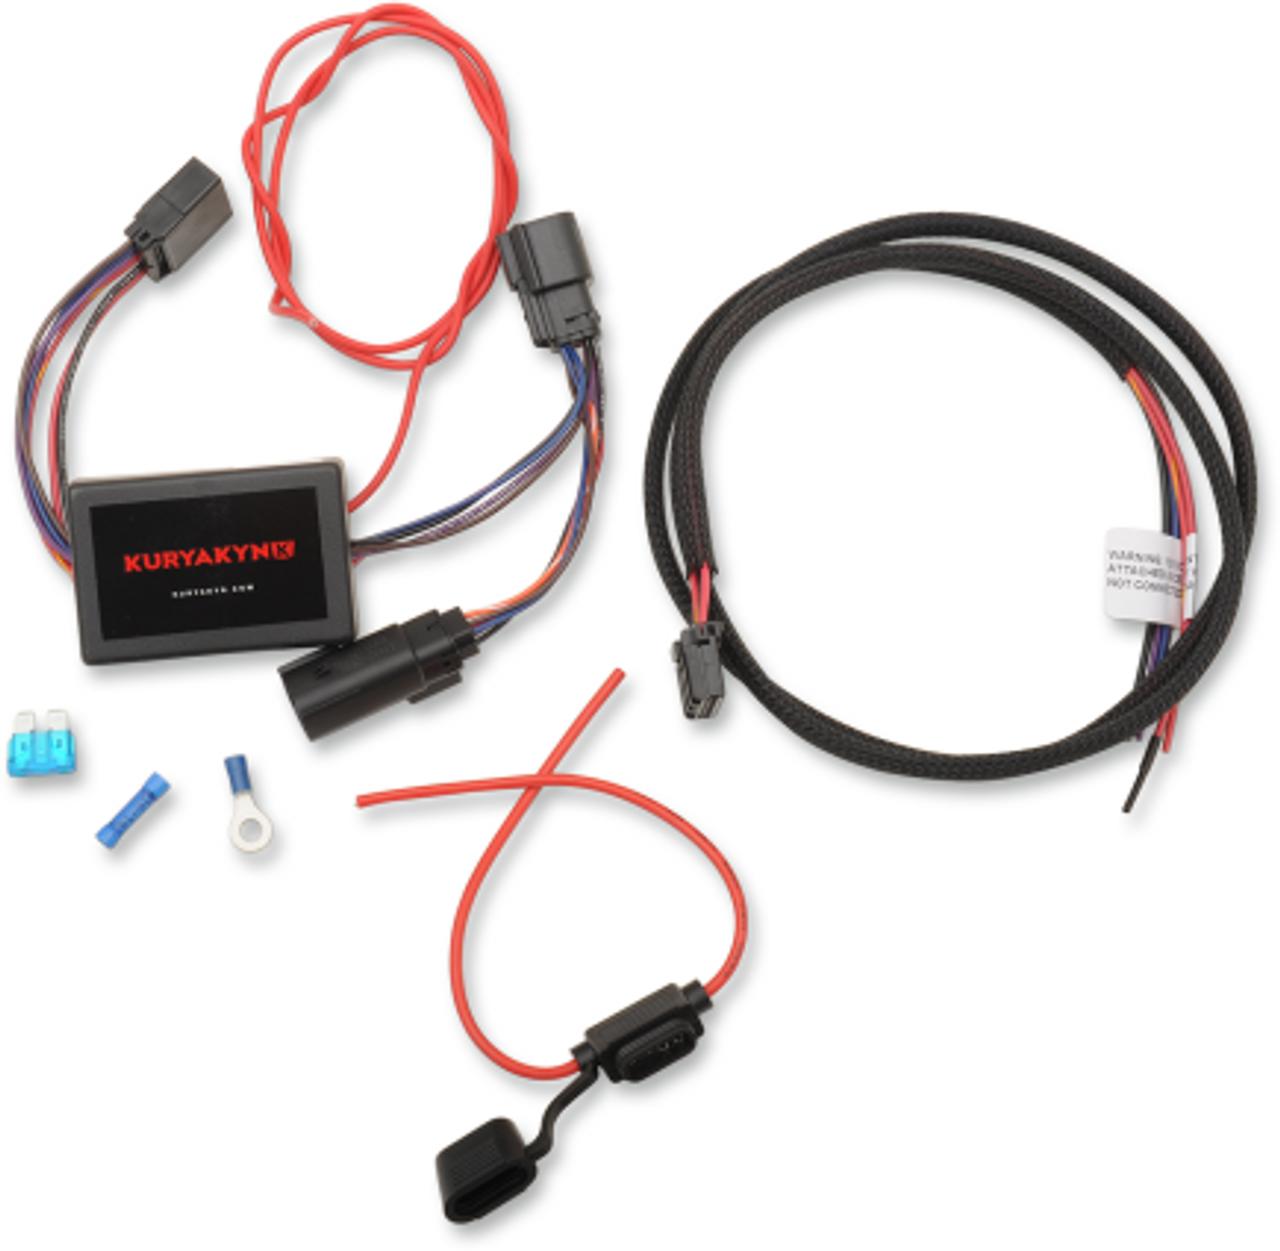 Kuryakyn Trailer Wiring Harness 4-Wire 2599